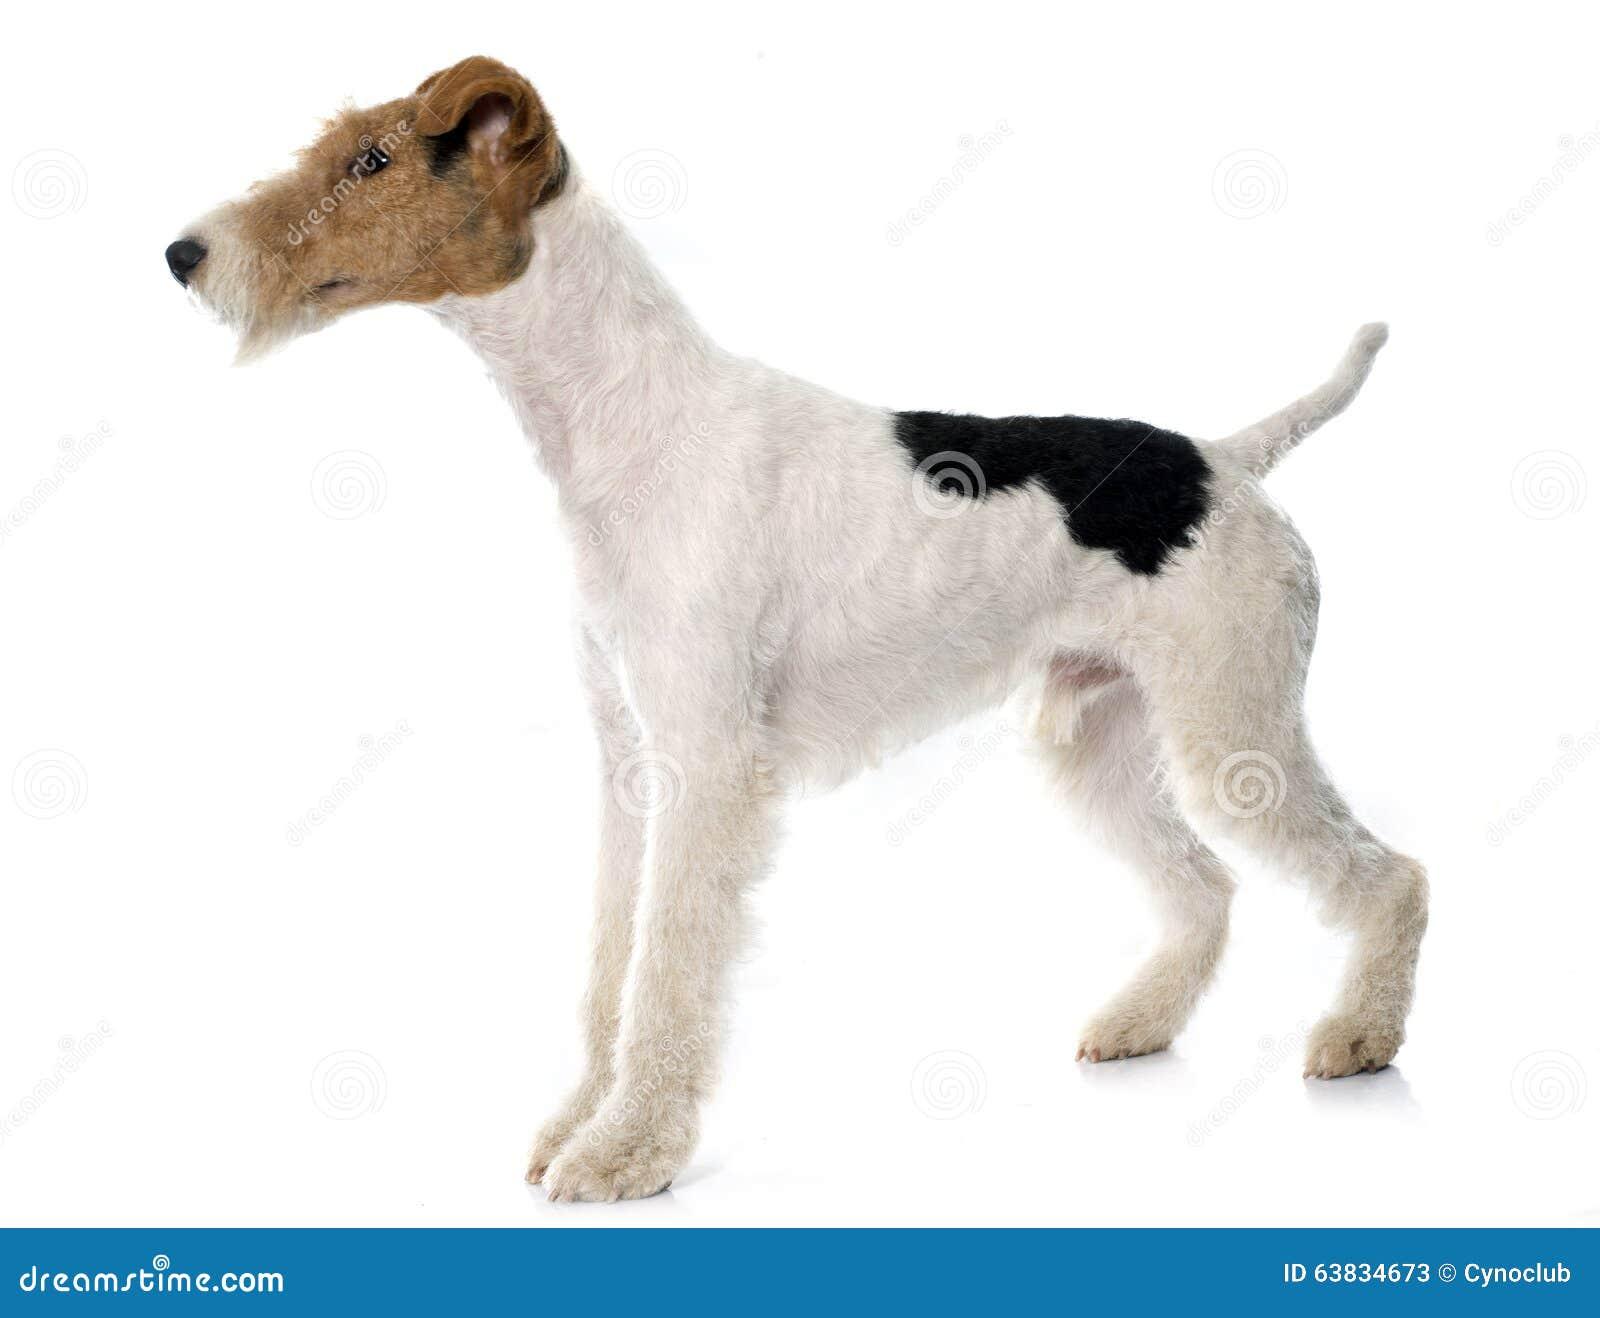 Purebred fox terrier stock image. Image of animal, studio - 63834673